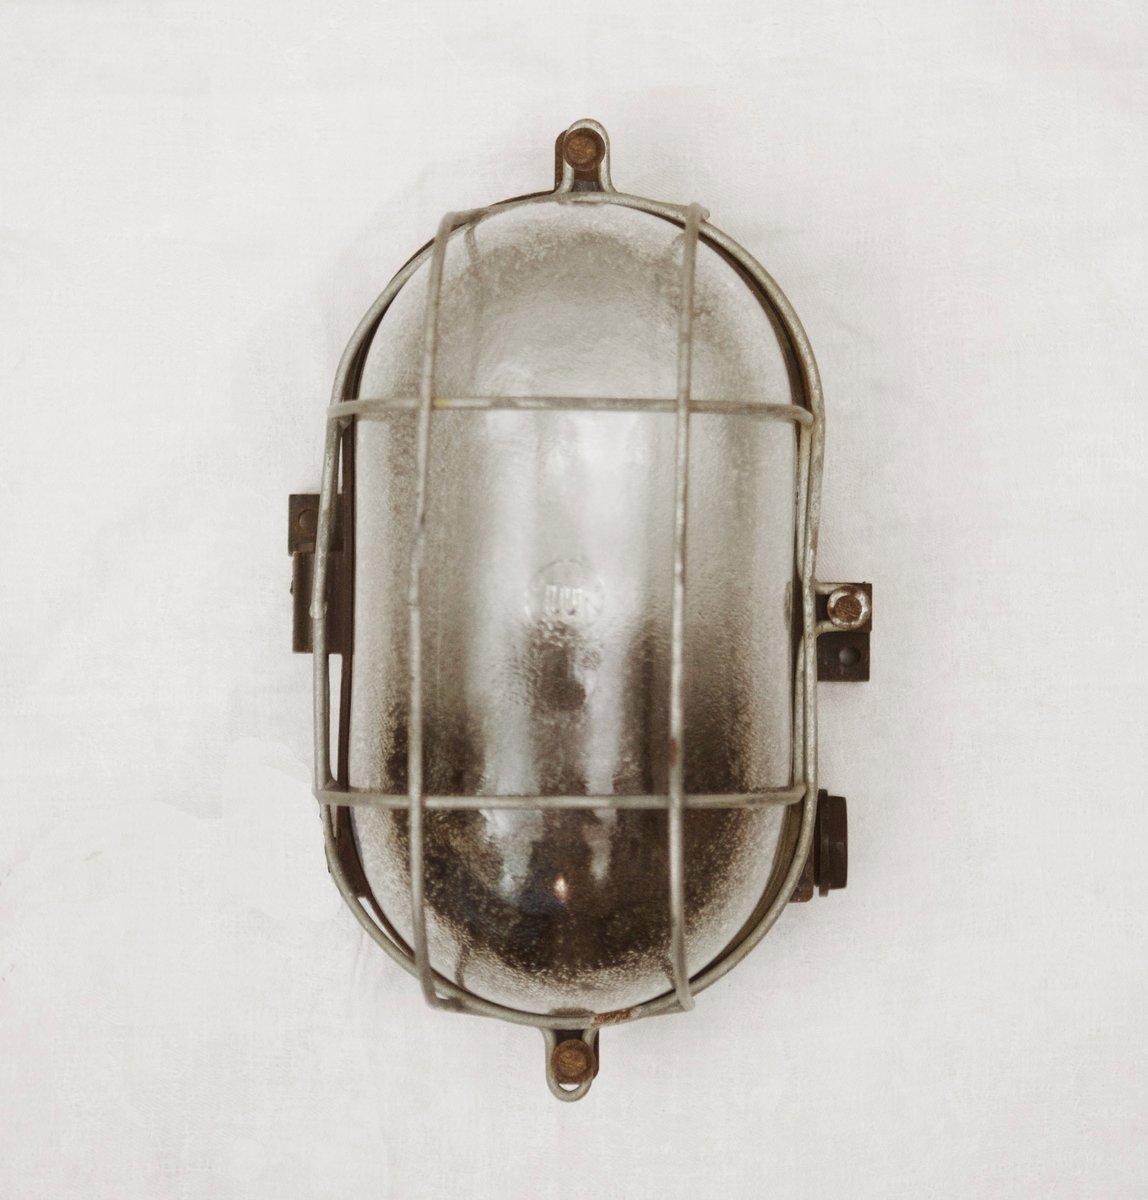 Industrielle Bakelit Wandlampe, 1948